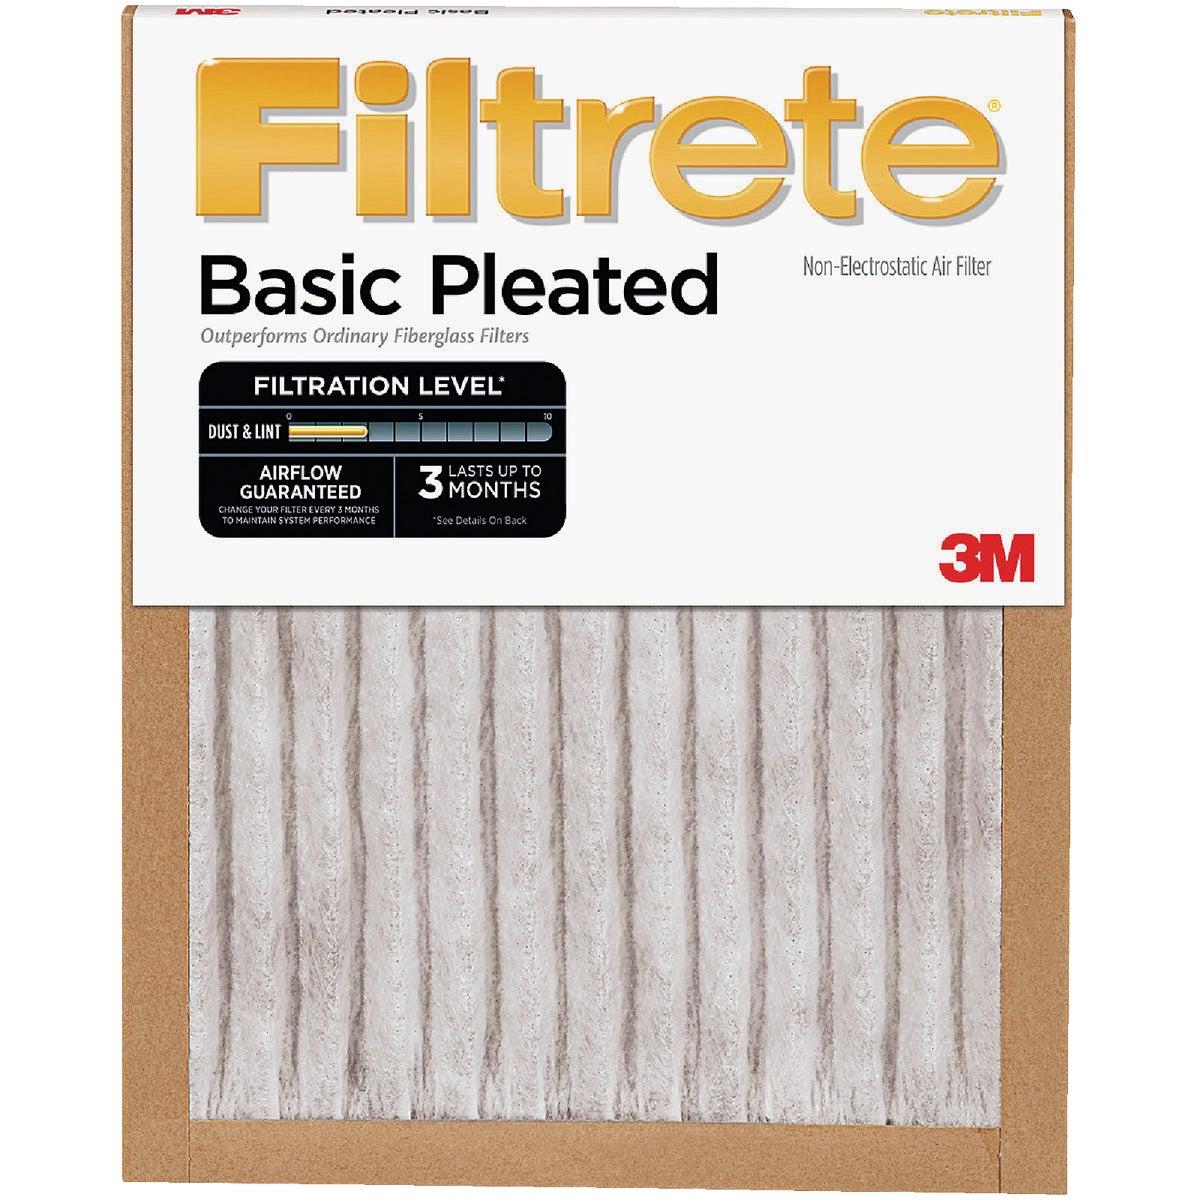 3M Filtrete 12 In. x 12 In. x 1 In. Basic Pleated 250 MPR Furnace Filter